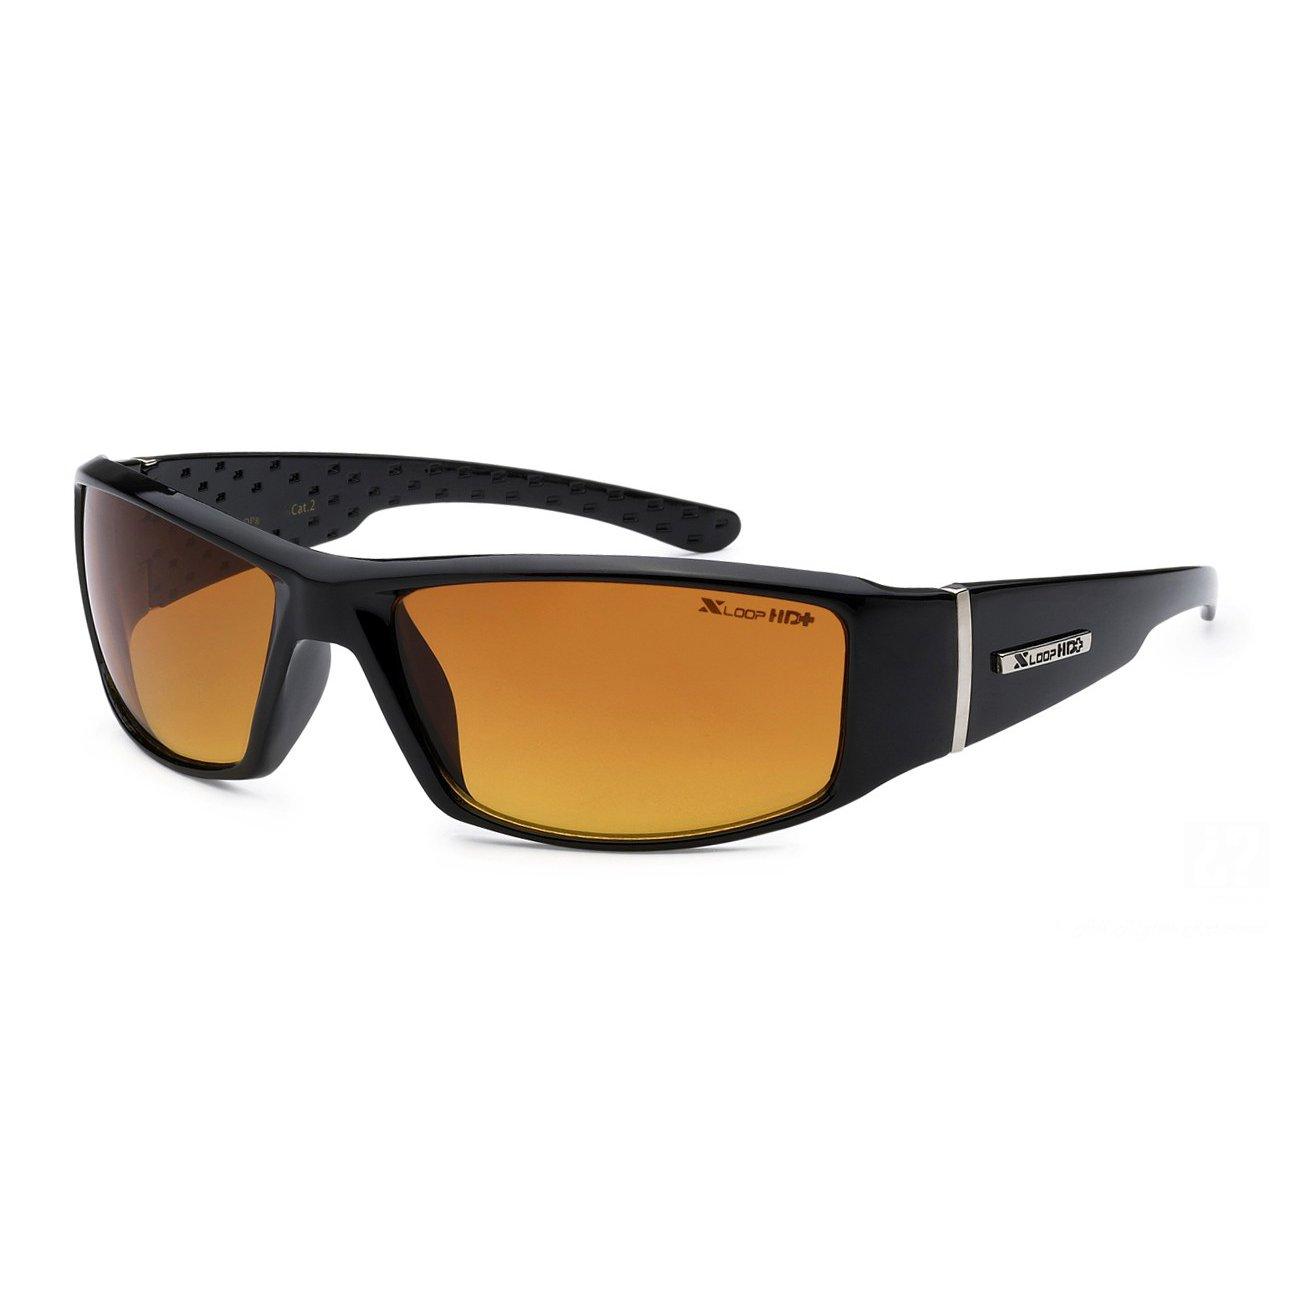 e76d537e595 Amazon.com  MODA Xloop Hd Vision Black High Definition Anti Glare Lens  Sunglasses Black 4098a  Shoes